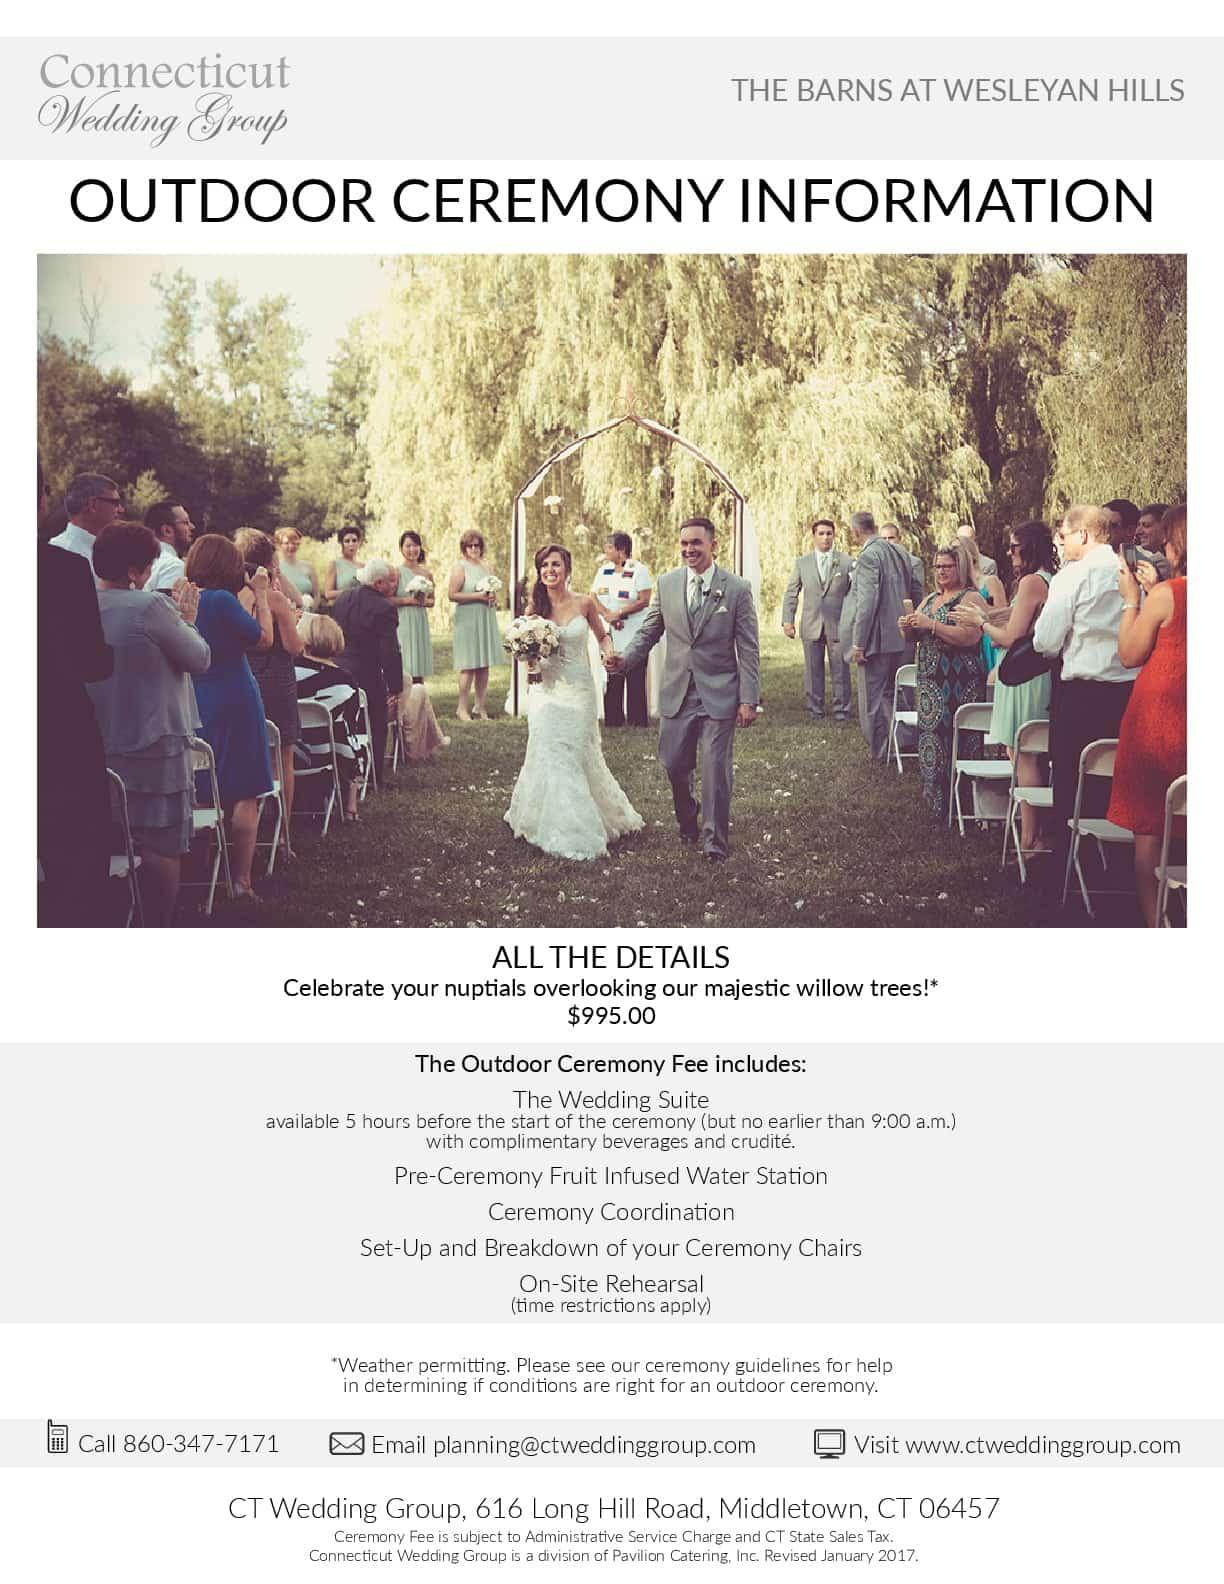 117_15308_Ceremony-Fee-Information_Barns_2018-001-min